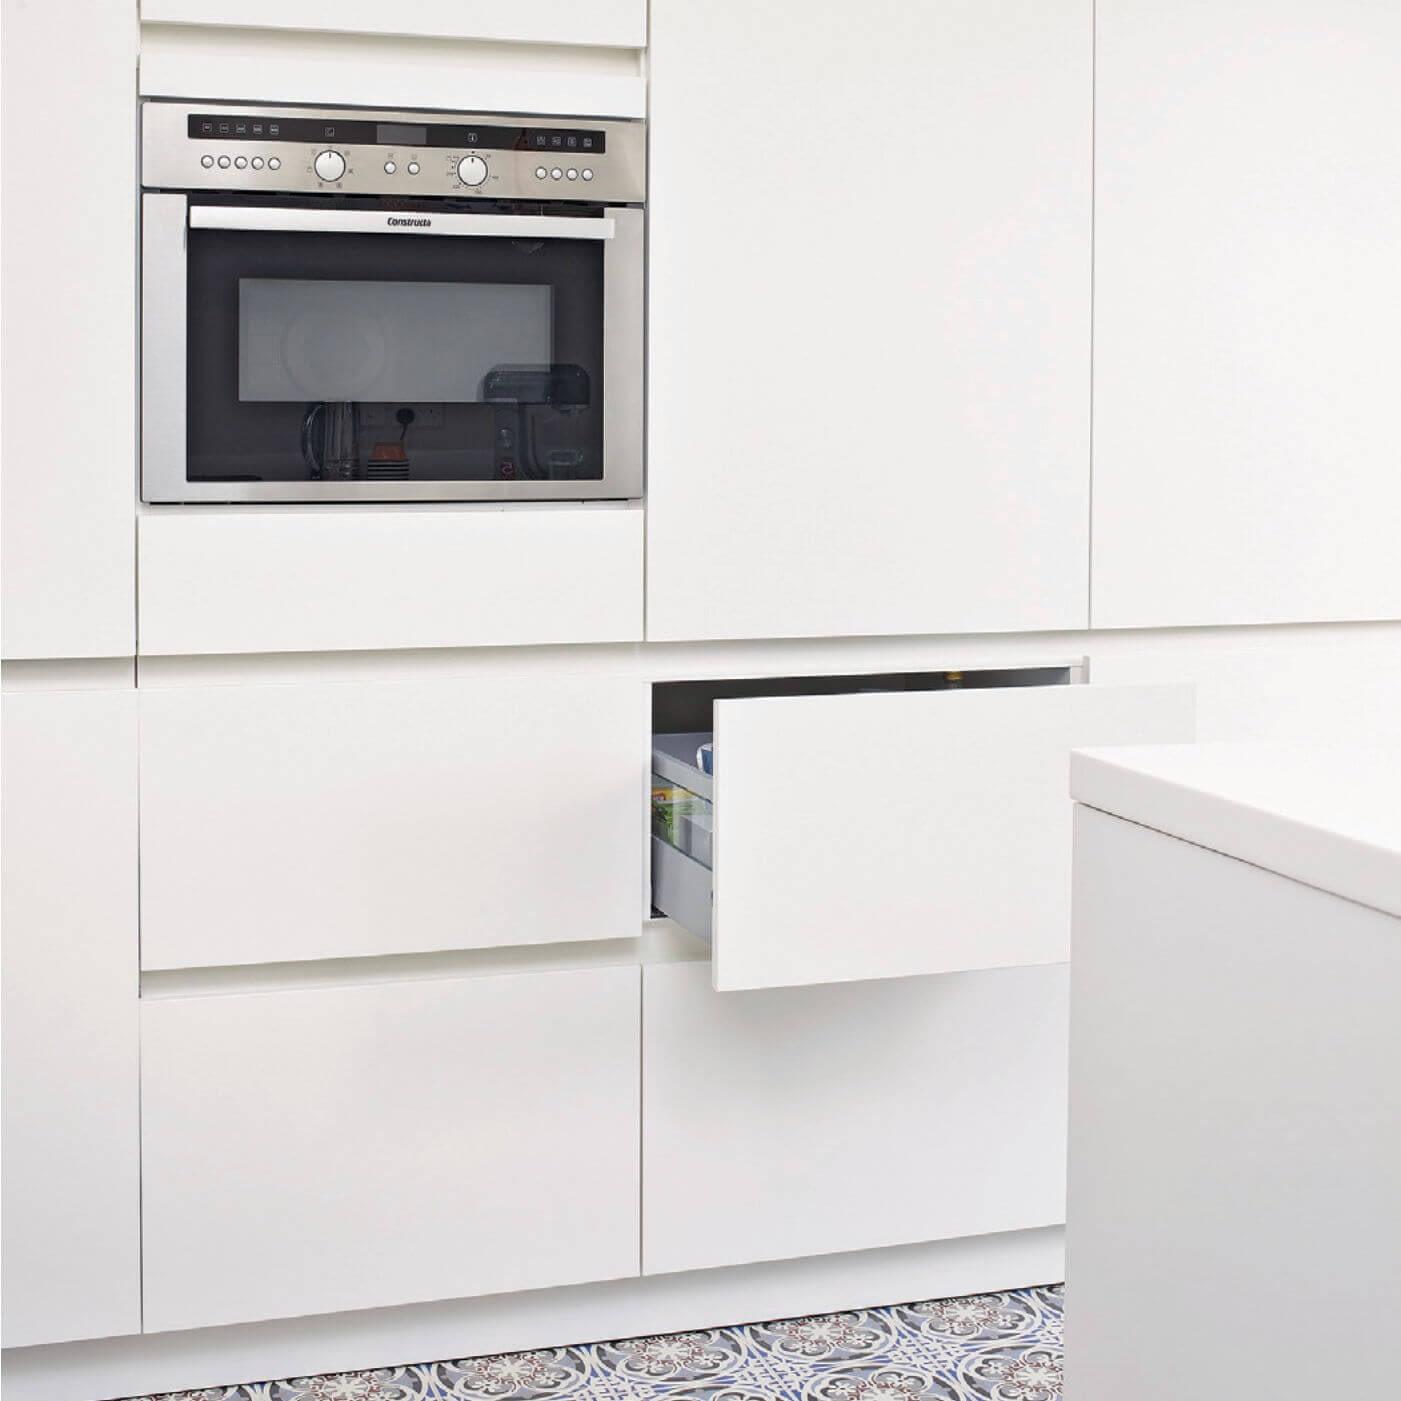 Tall Kitchen Units in White